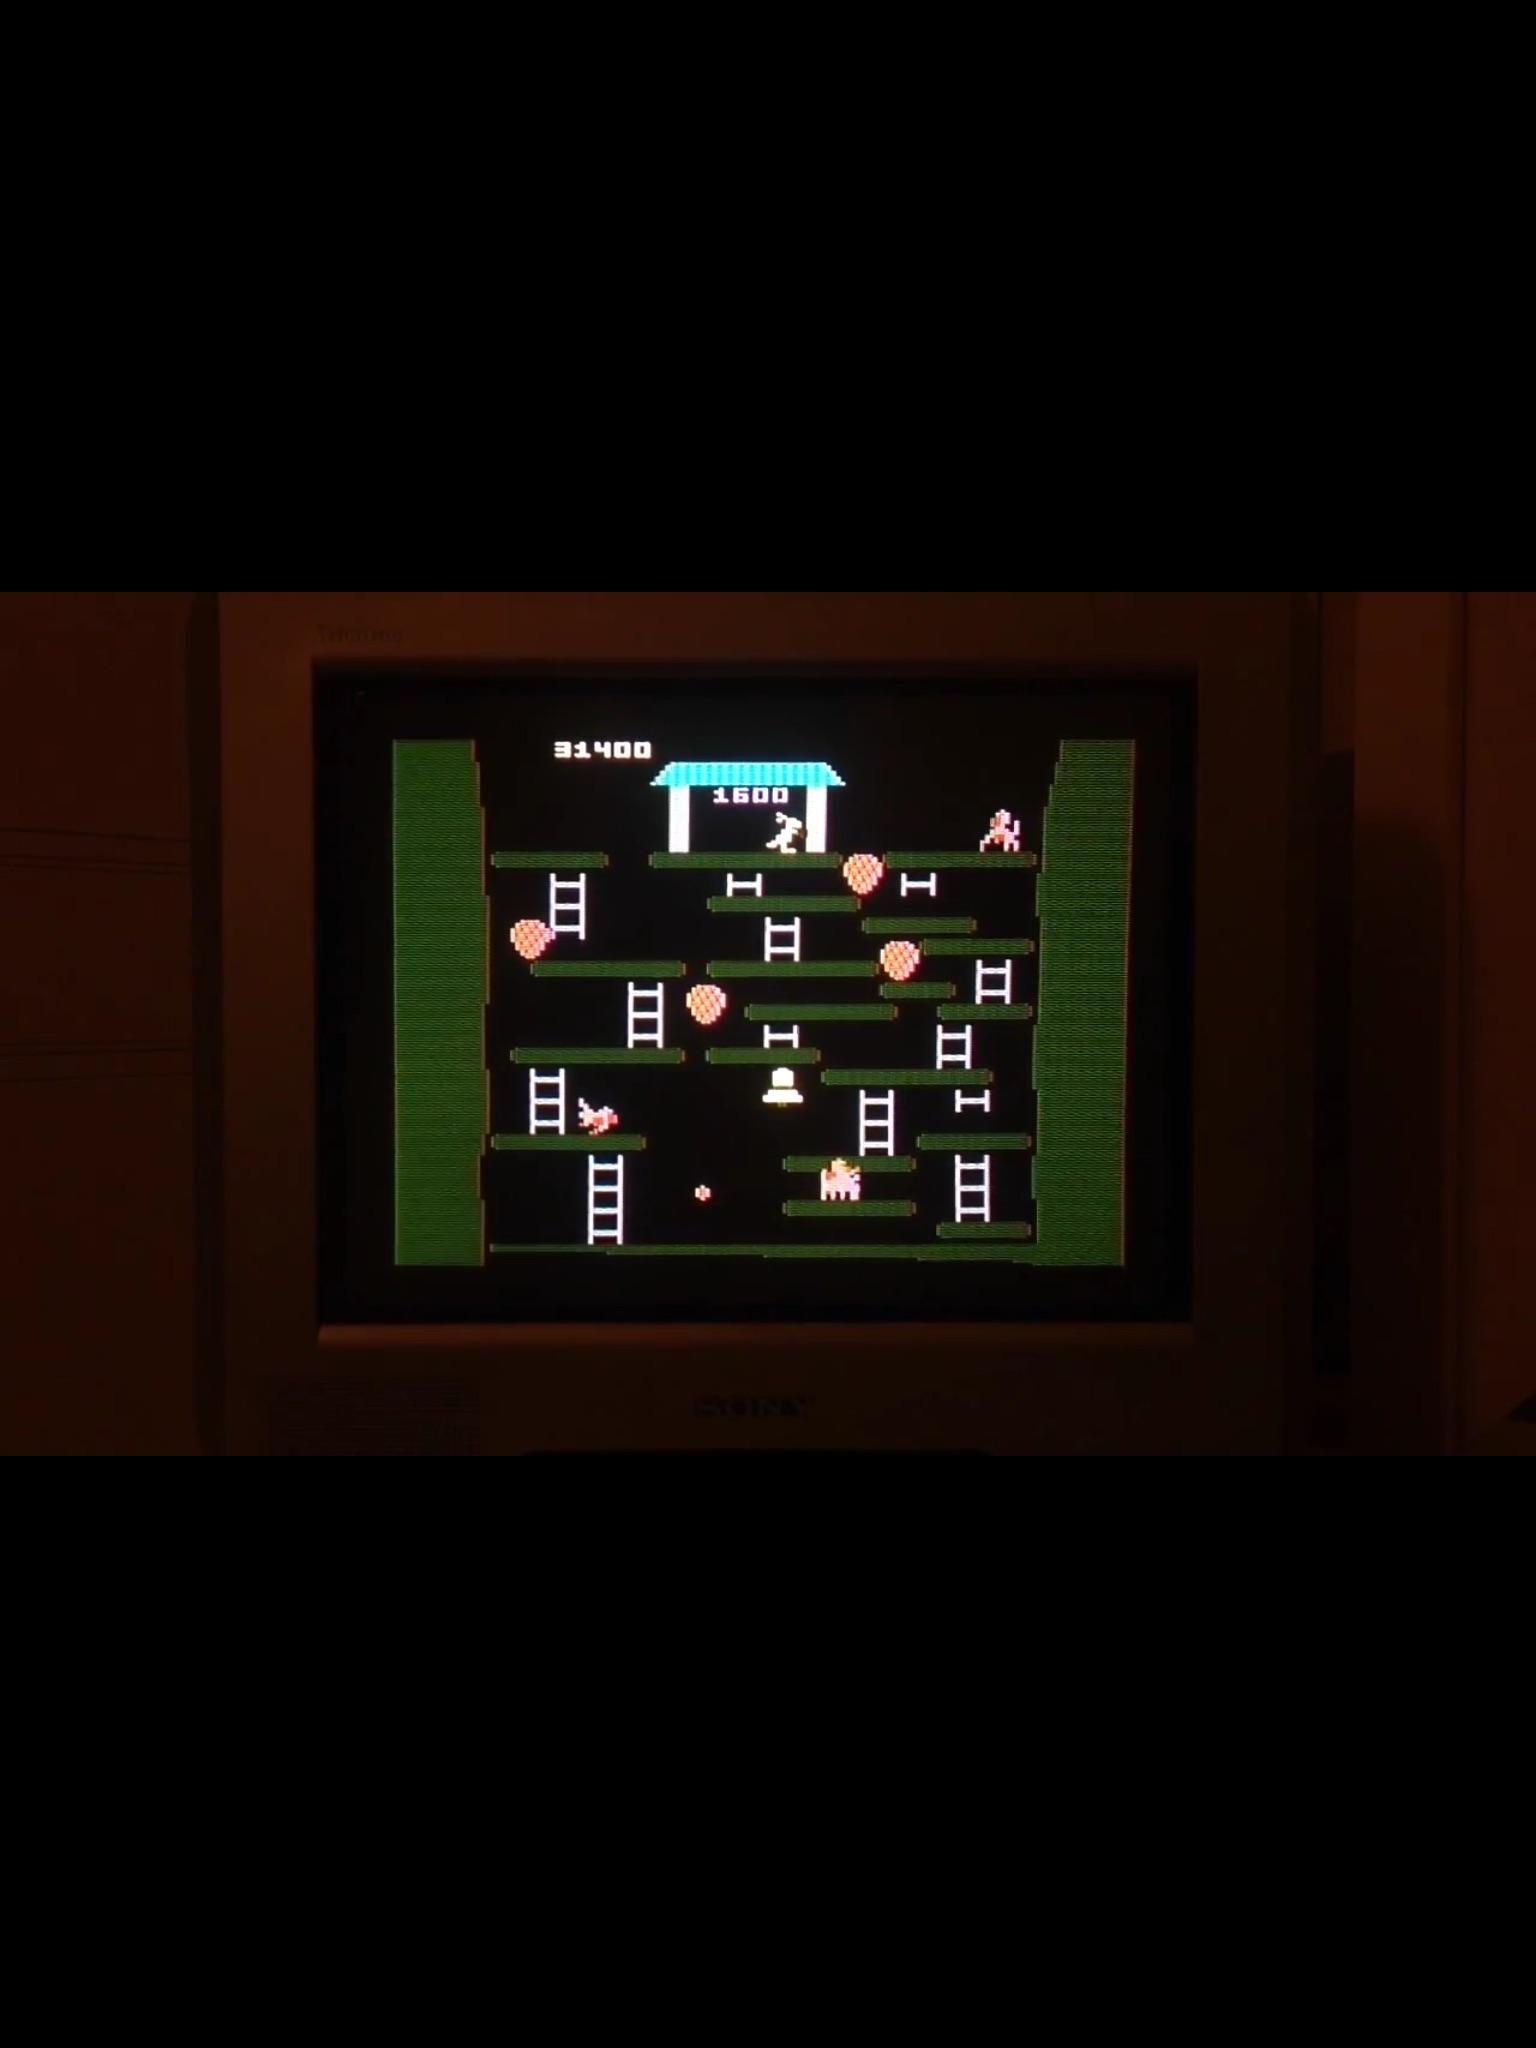 CoCoForest: Kangaroo: Advanced (Atari 5200) 31,400 points on 2015-01-17 12:06:10